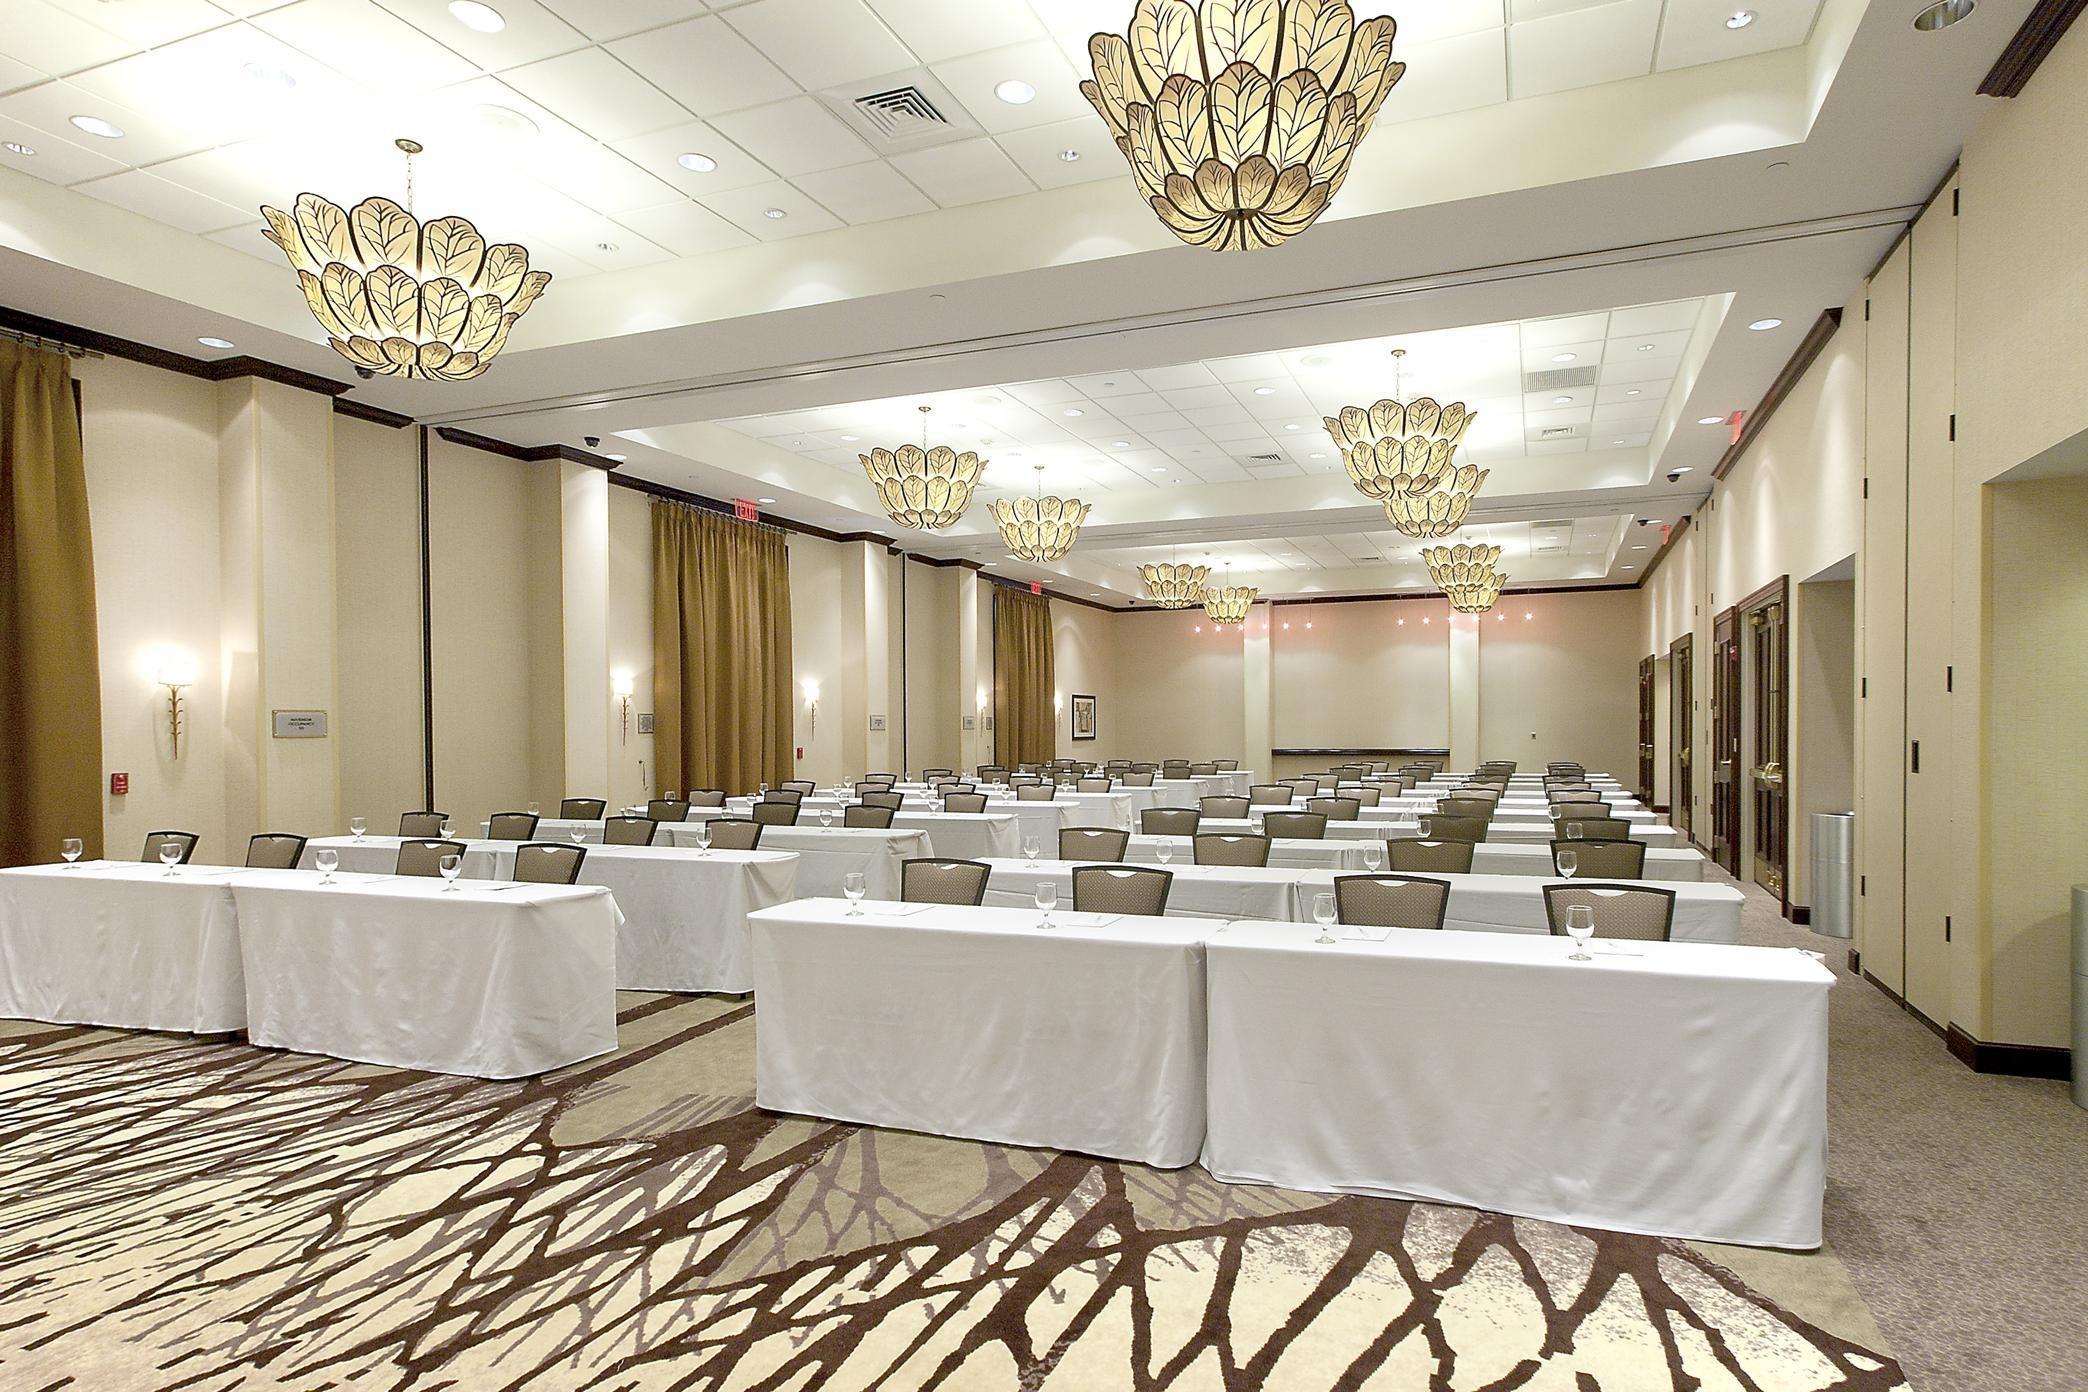 Embassy Suites by Hilton Savannah Airport image 22